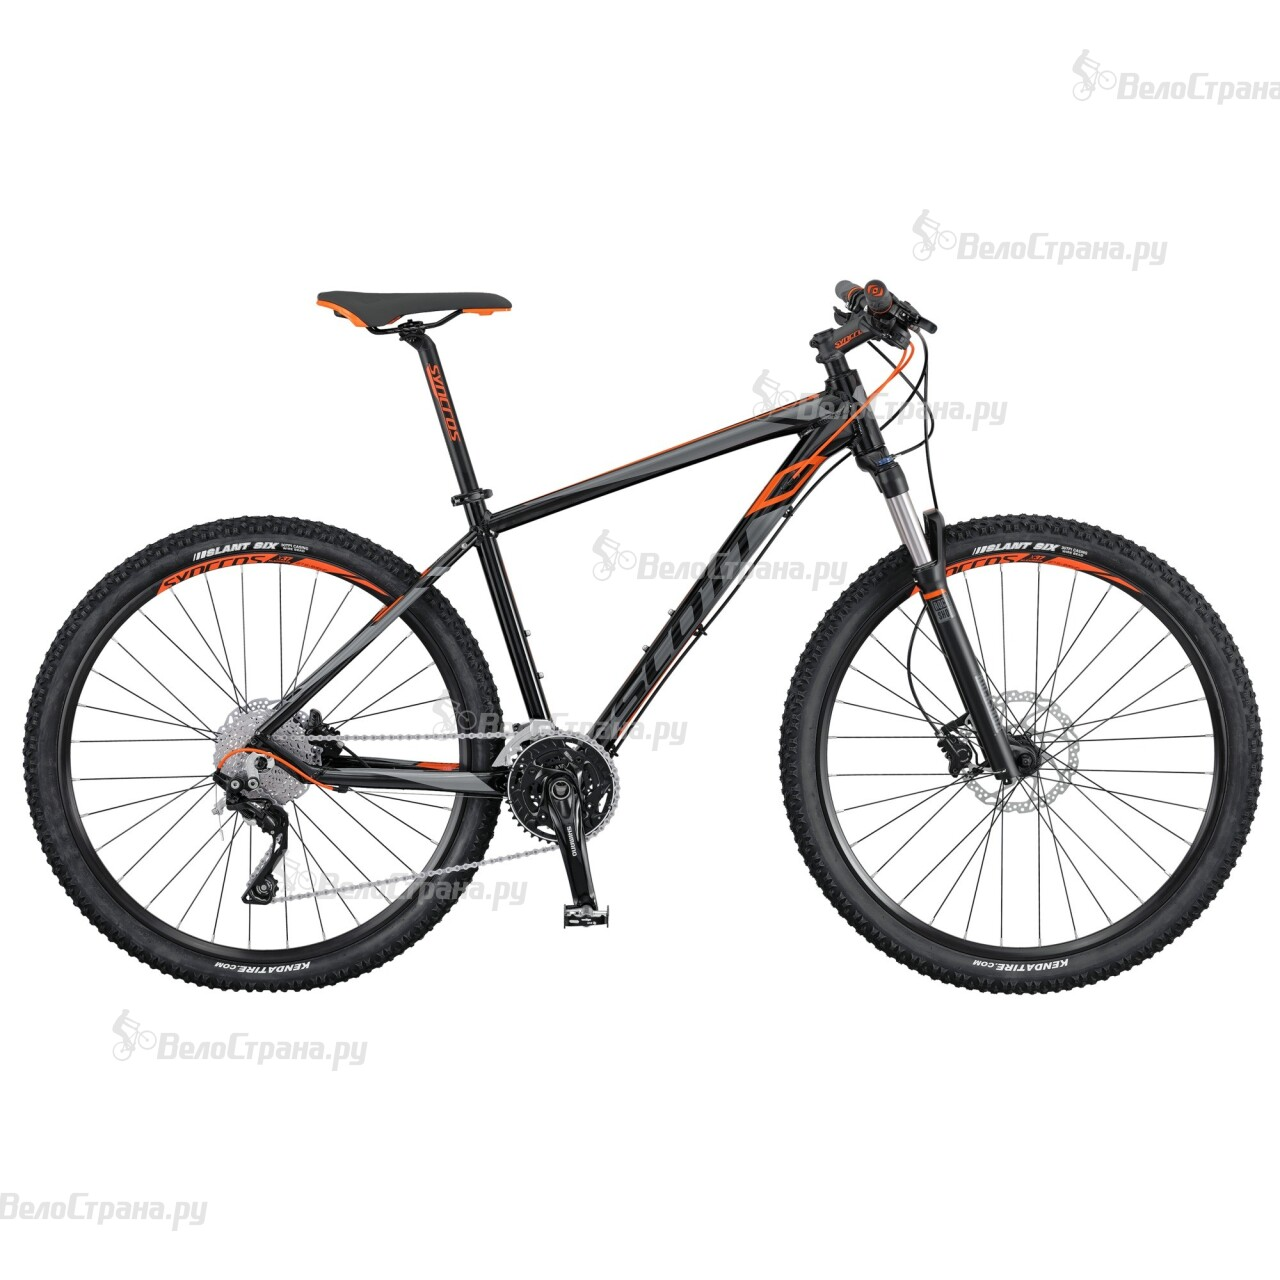 Велосипед Scott Aspect 710 (2016) велосипед scott aspect 720 27 5 2016